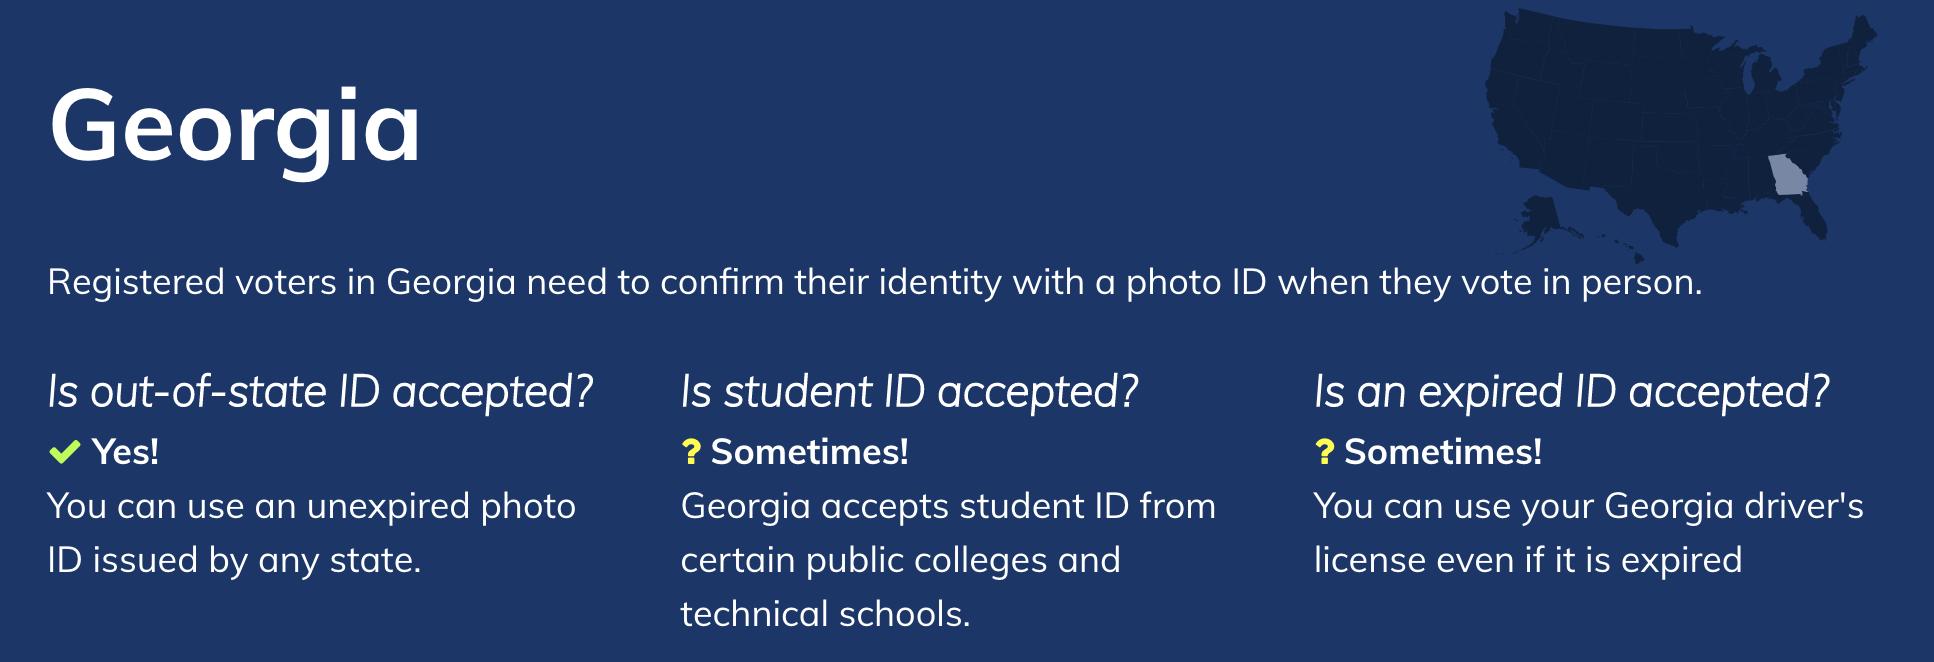 Georgia Voter ID laws